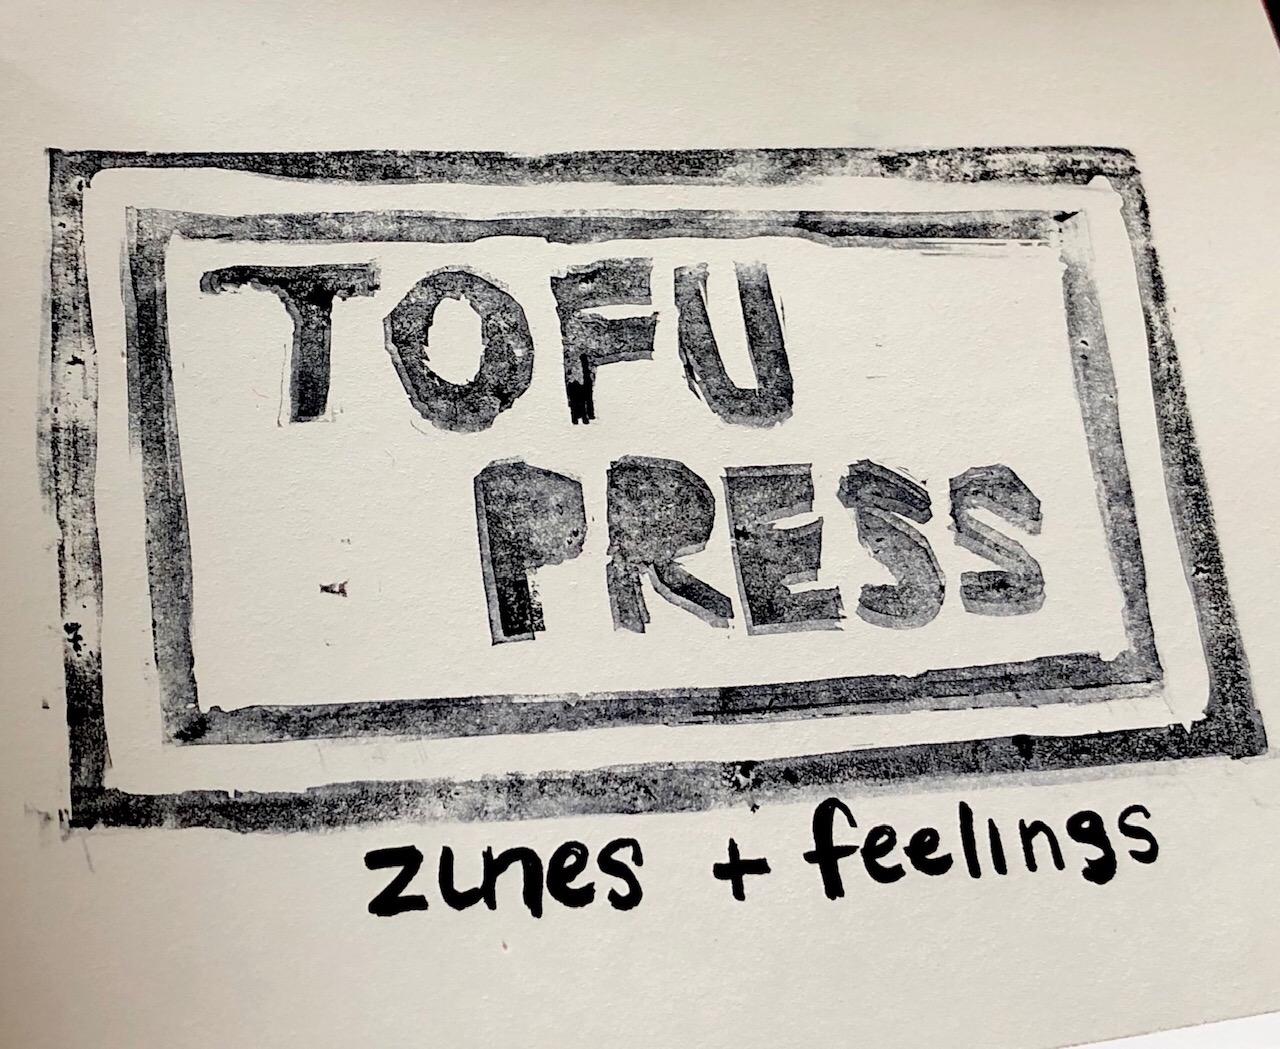 tofupresszines.com